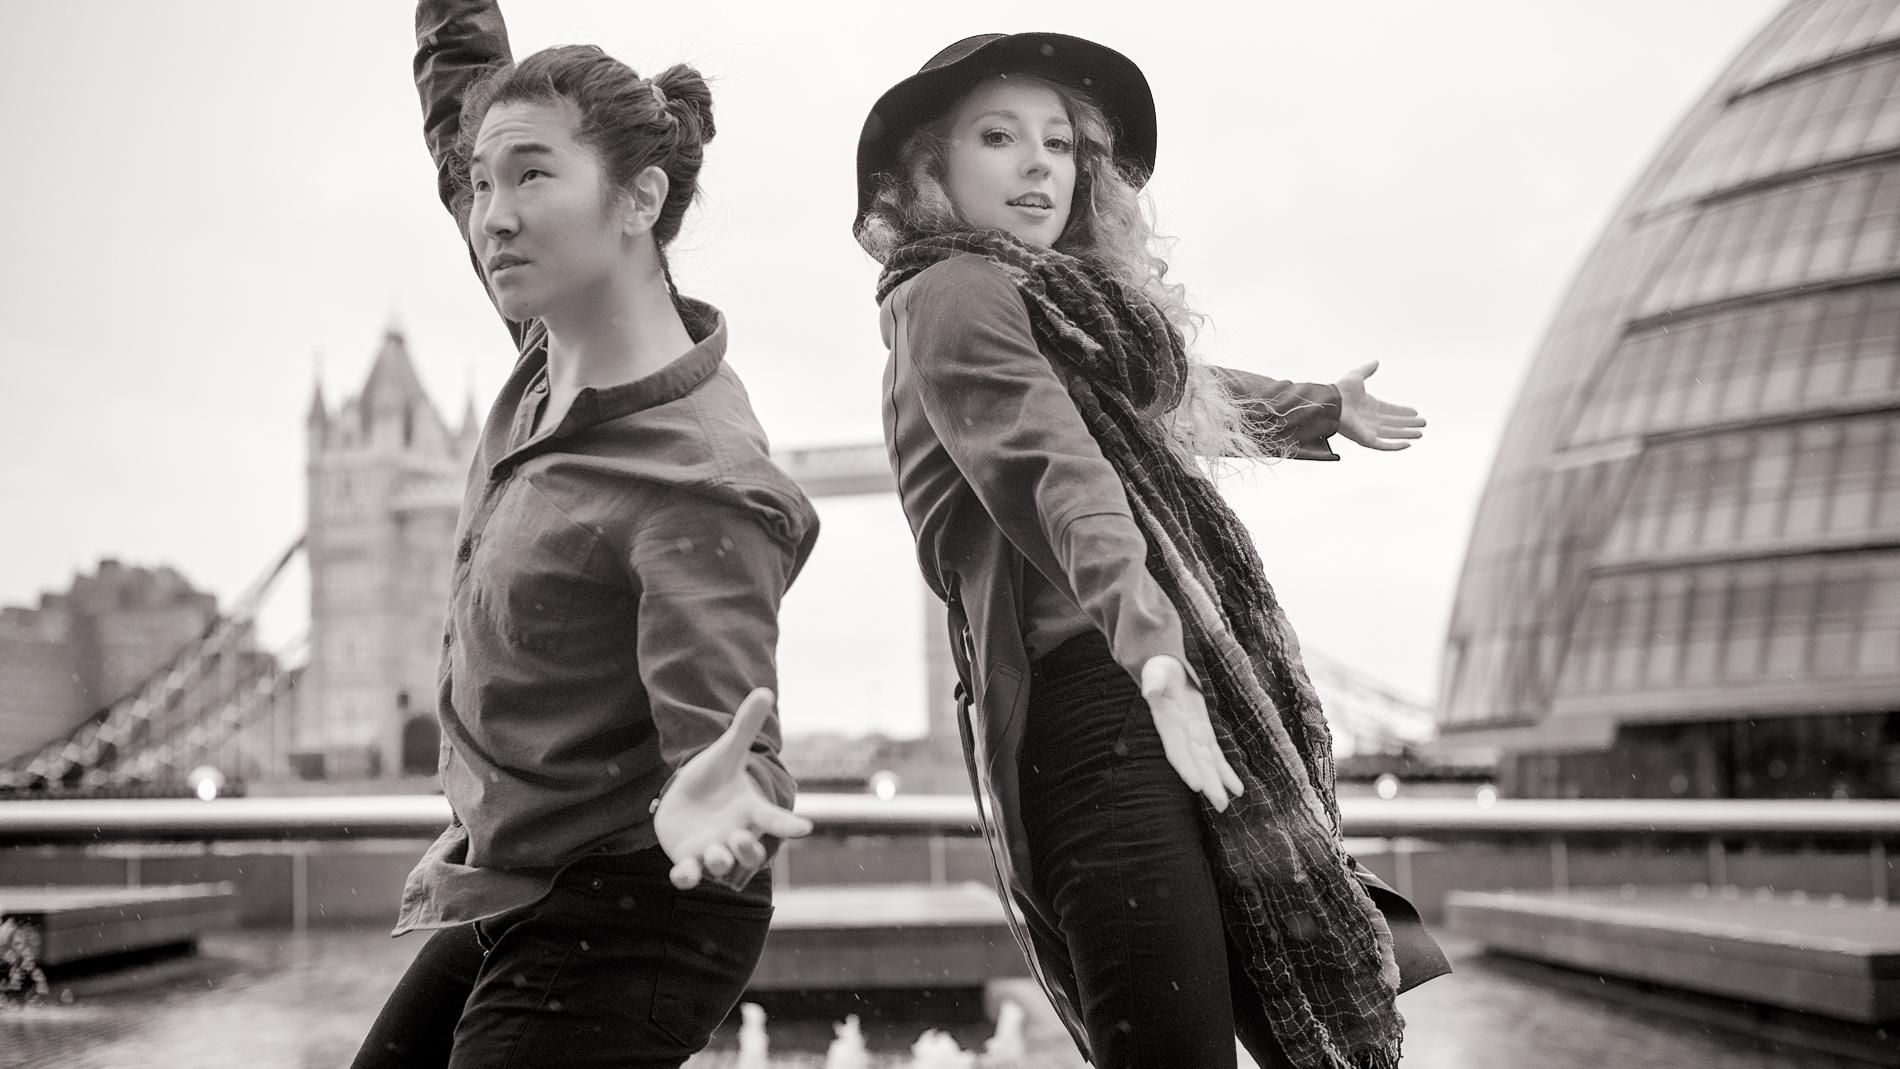 MORE LONDON    ⫩    More London Riverside, London   dancer:   Daniel Persson & Sarah Bateman     SEE THIS BLOG POST ON MY WEBSITE:https://vesaloikas.com/art-blog/london-town